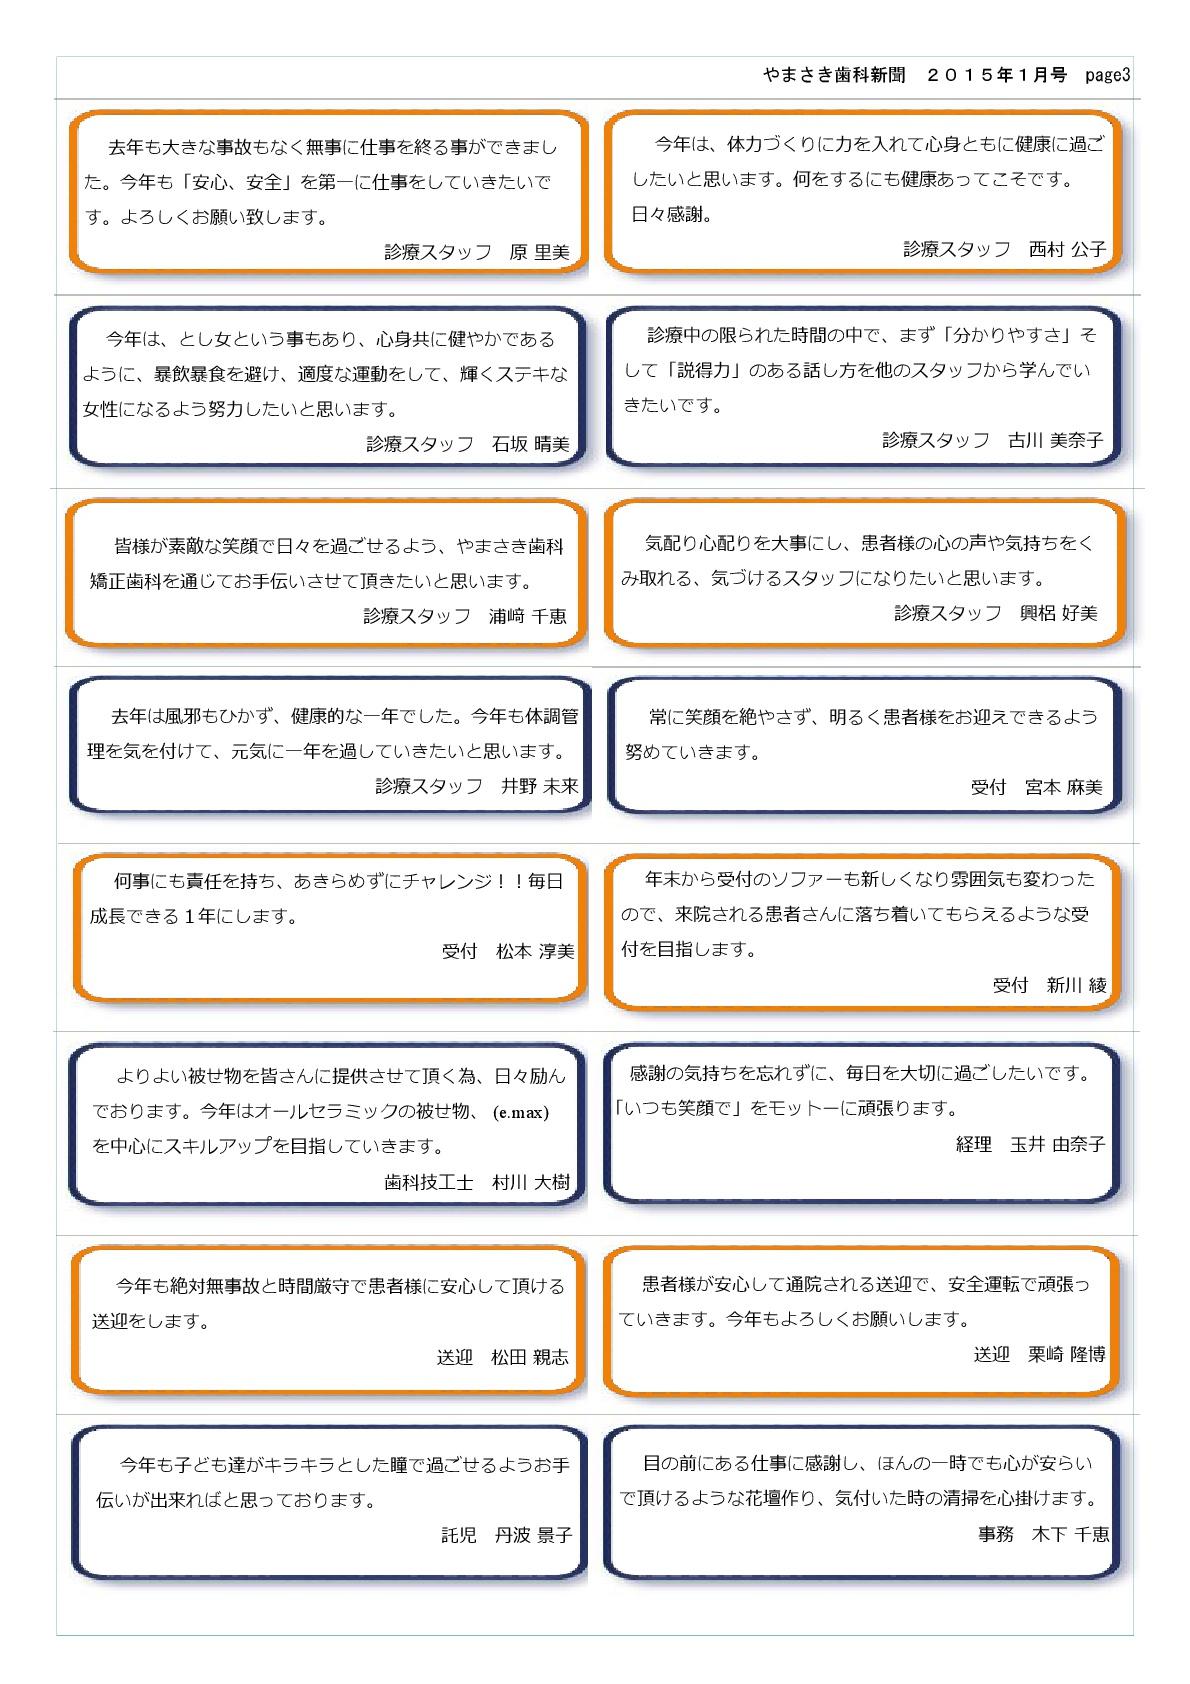 sinbun15-1-2-002